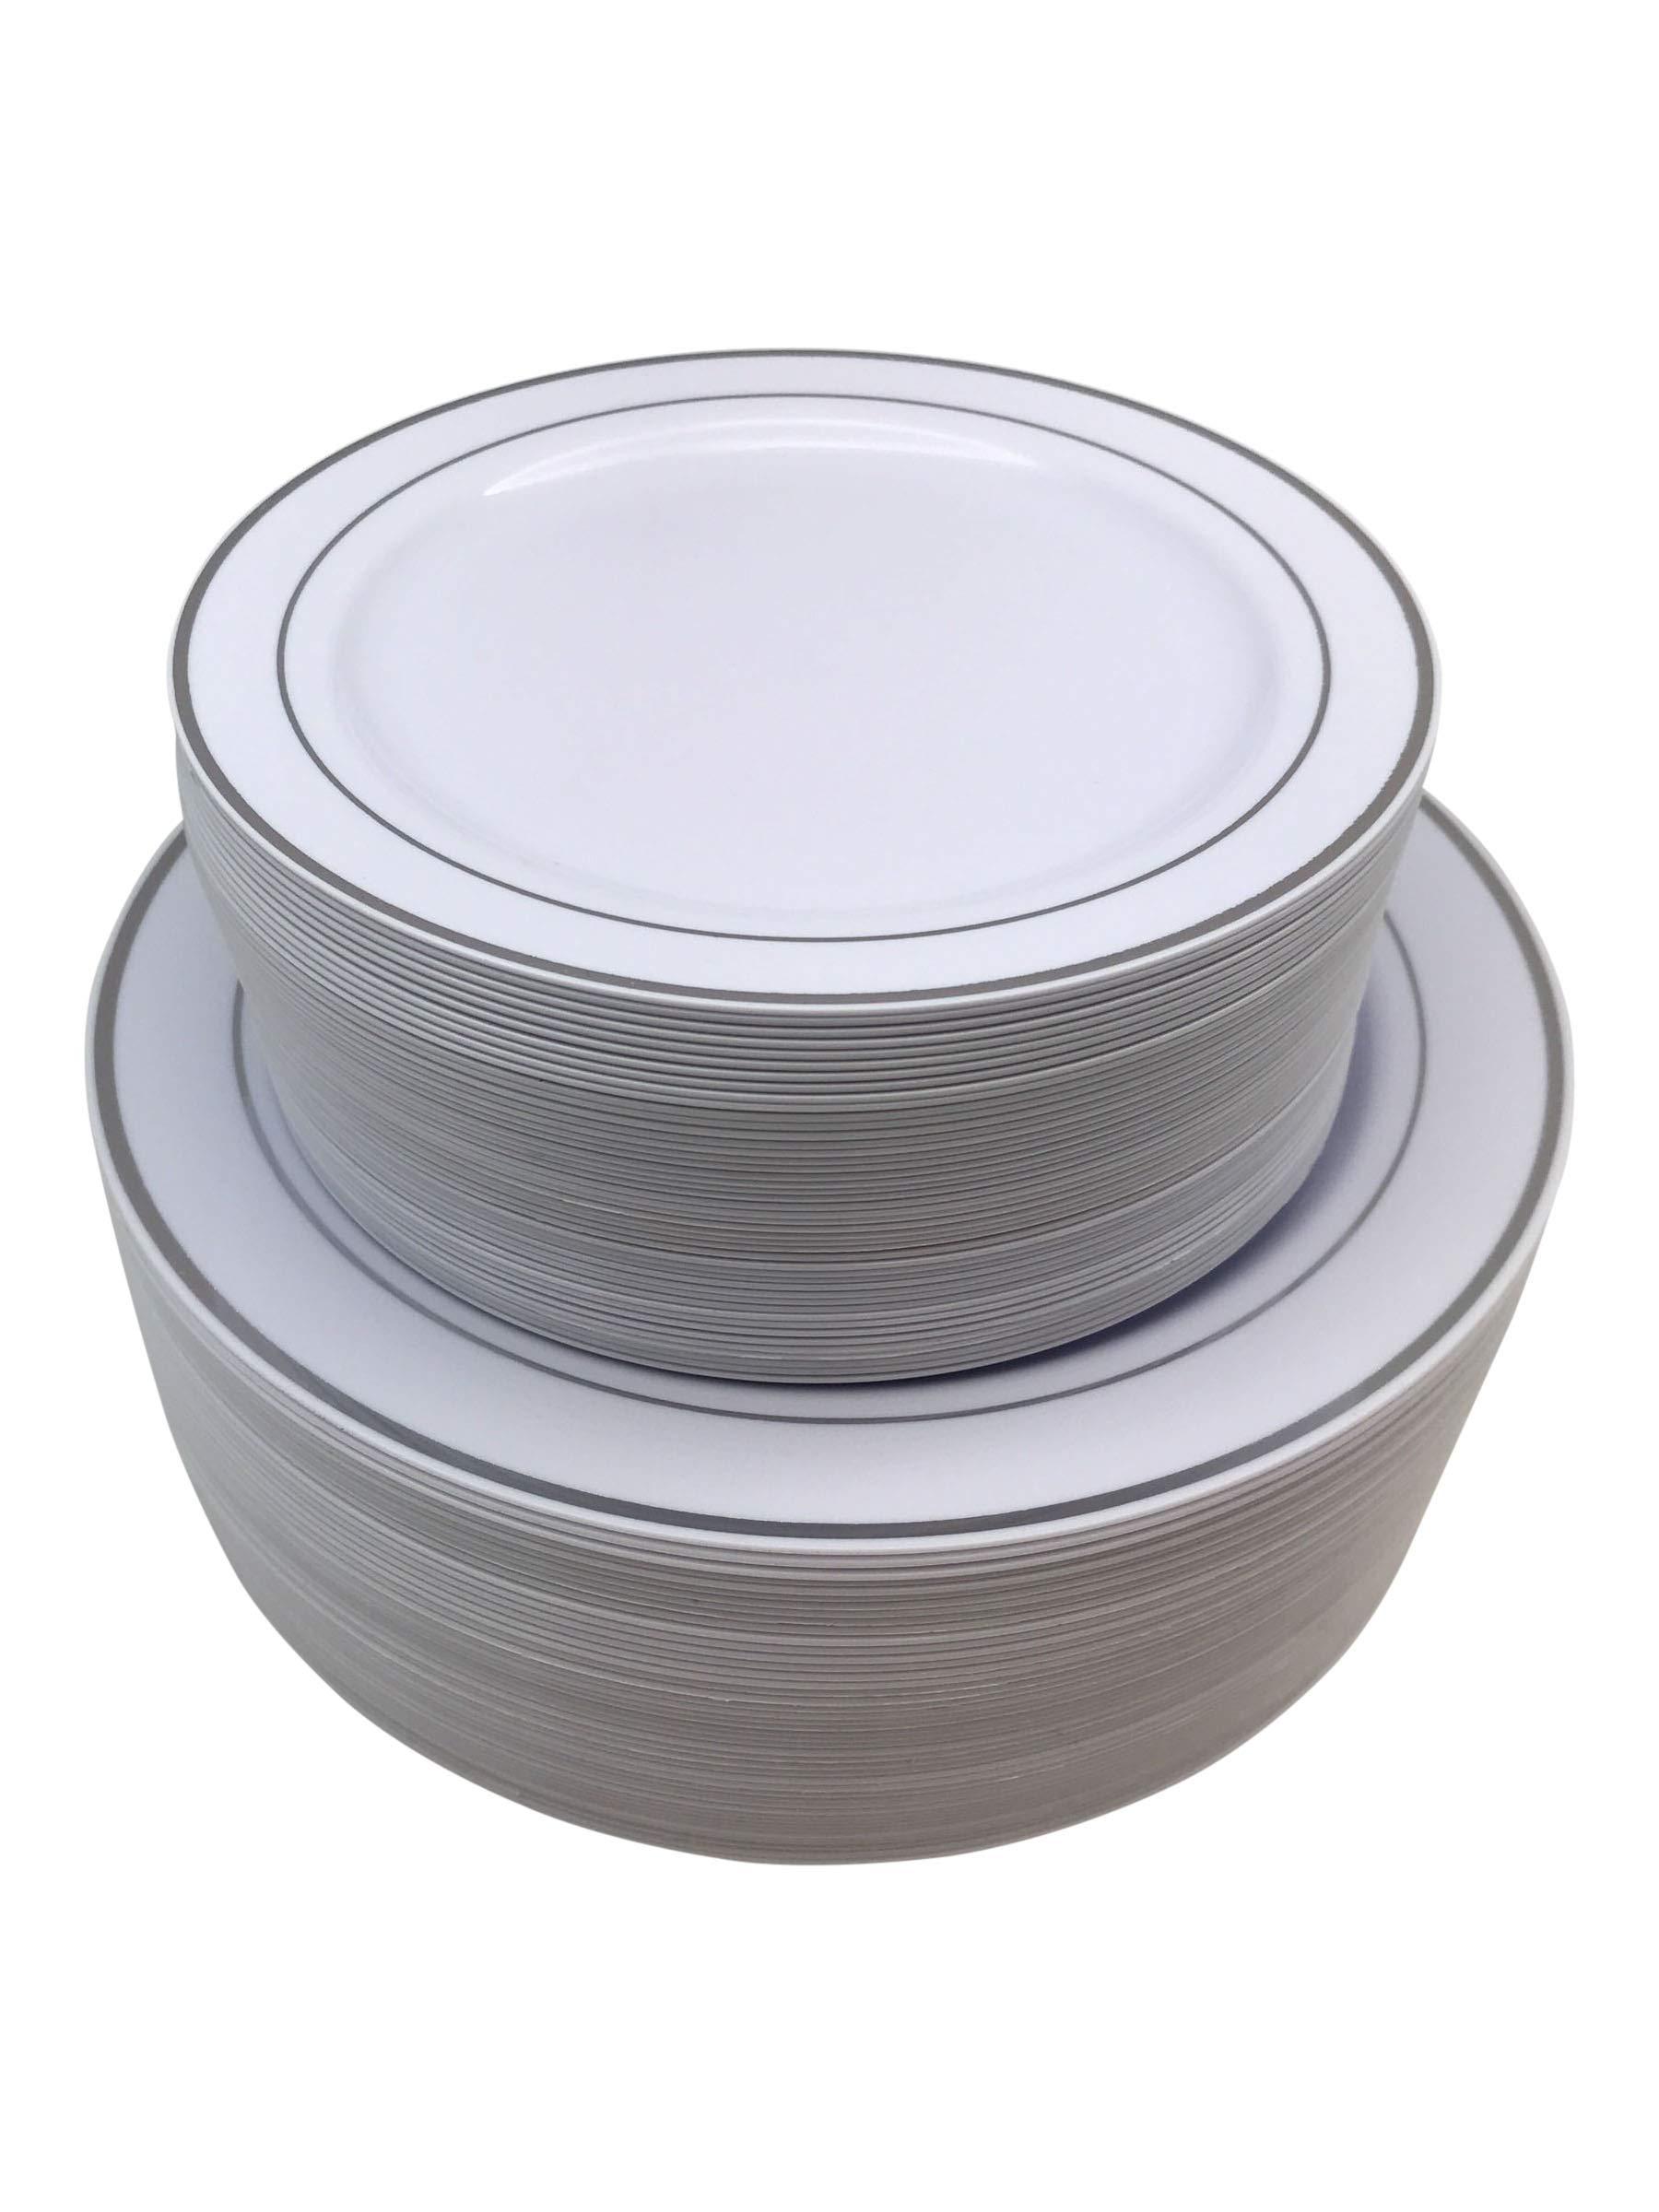 90 Piece Silver Rimmed Premium Disposable Plastic